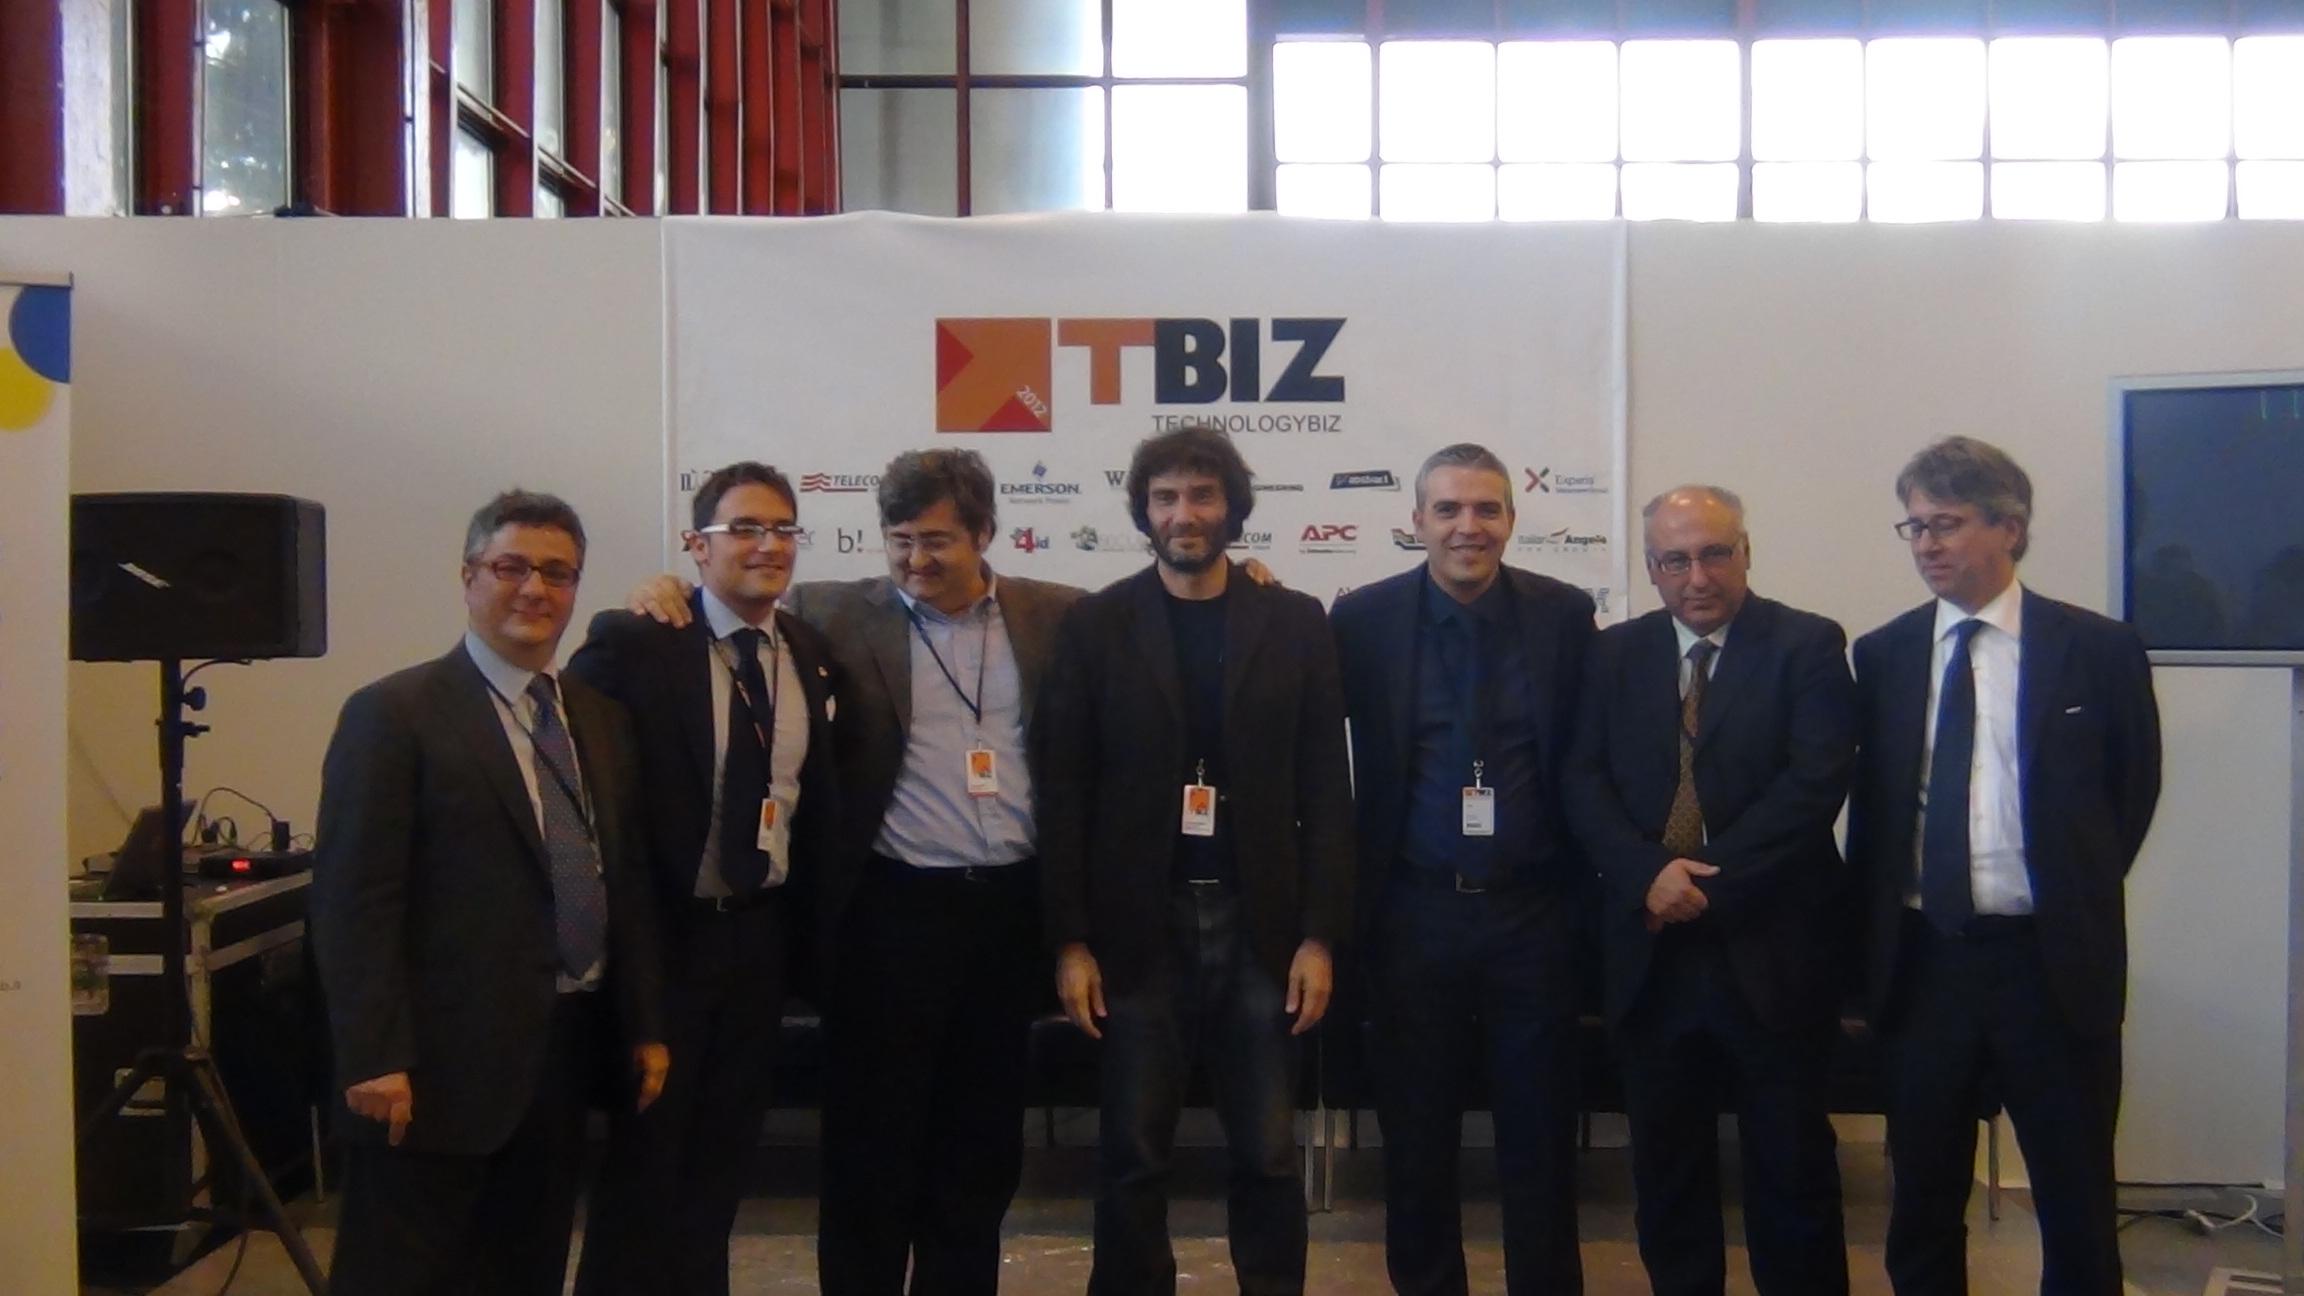 Technology Biz 2012